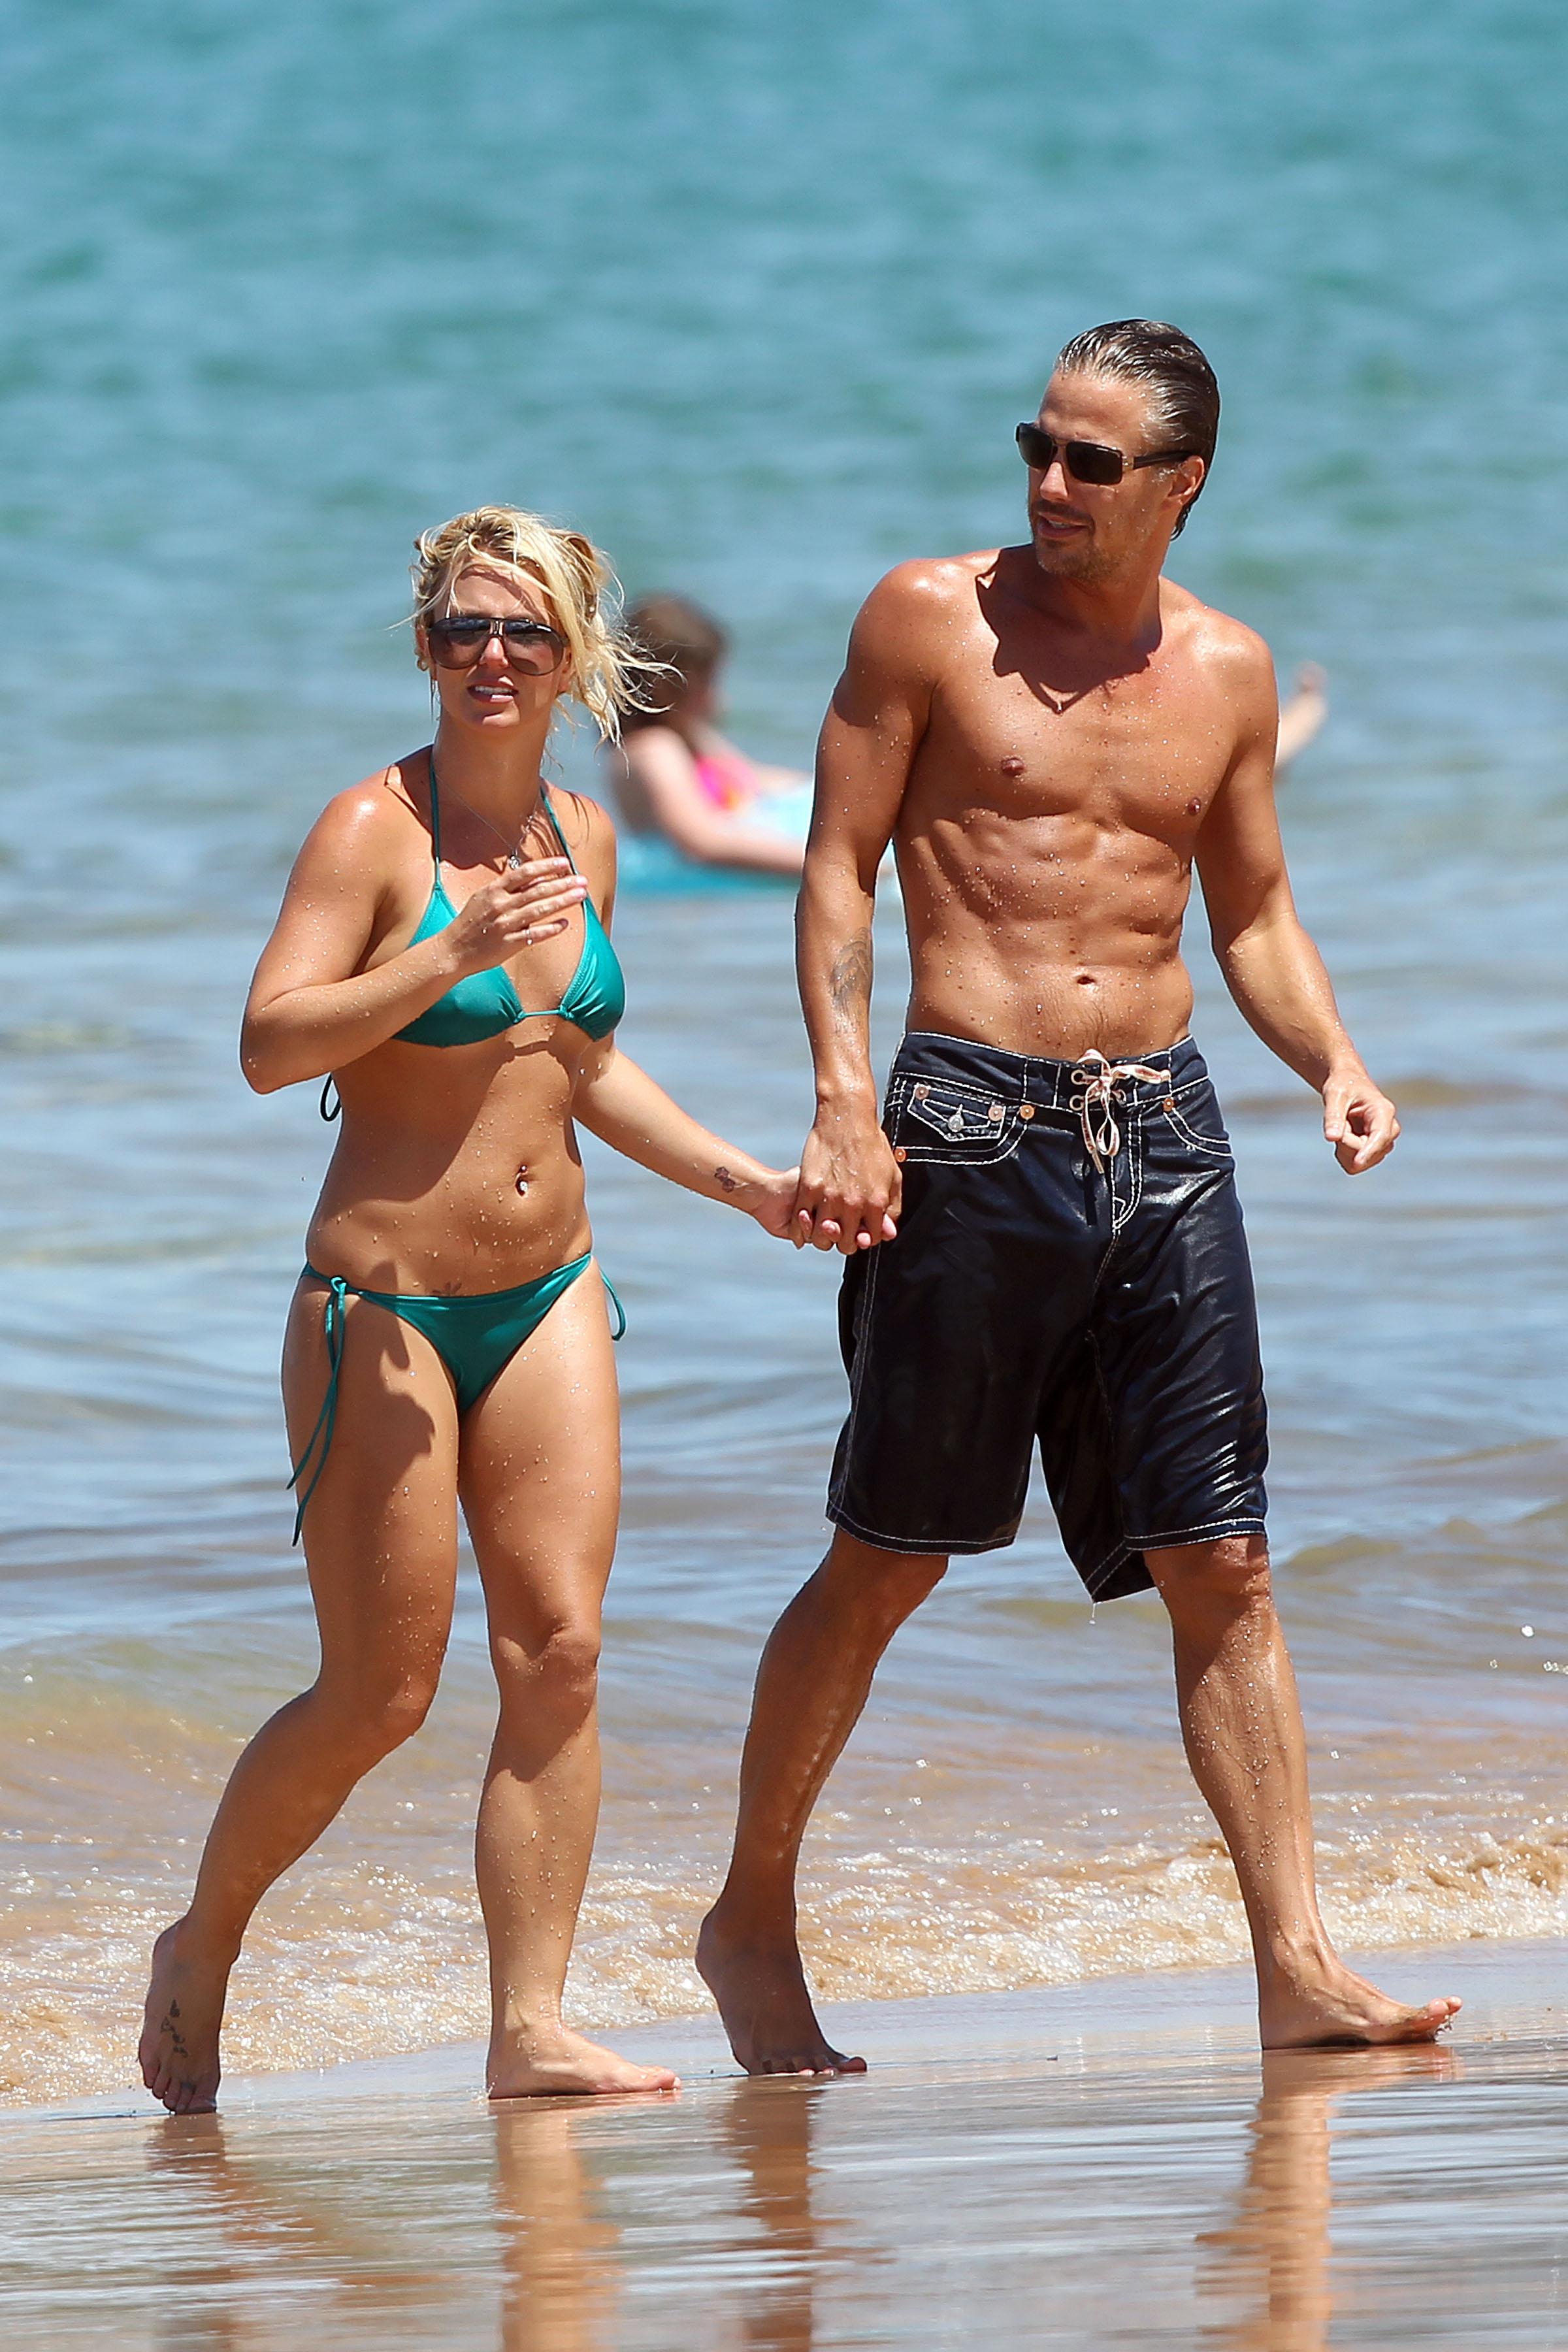 21544_Britney_Spears_on_the_beach_in_Maui_7_122_356lo.jpg